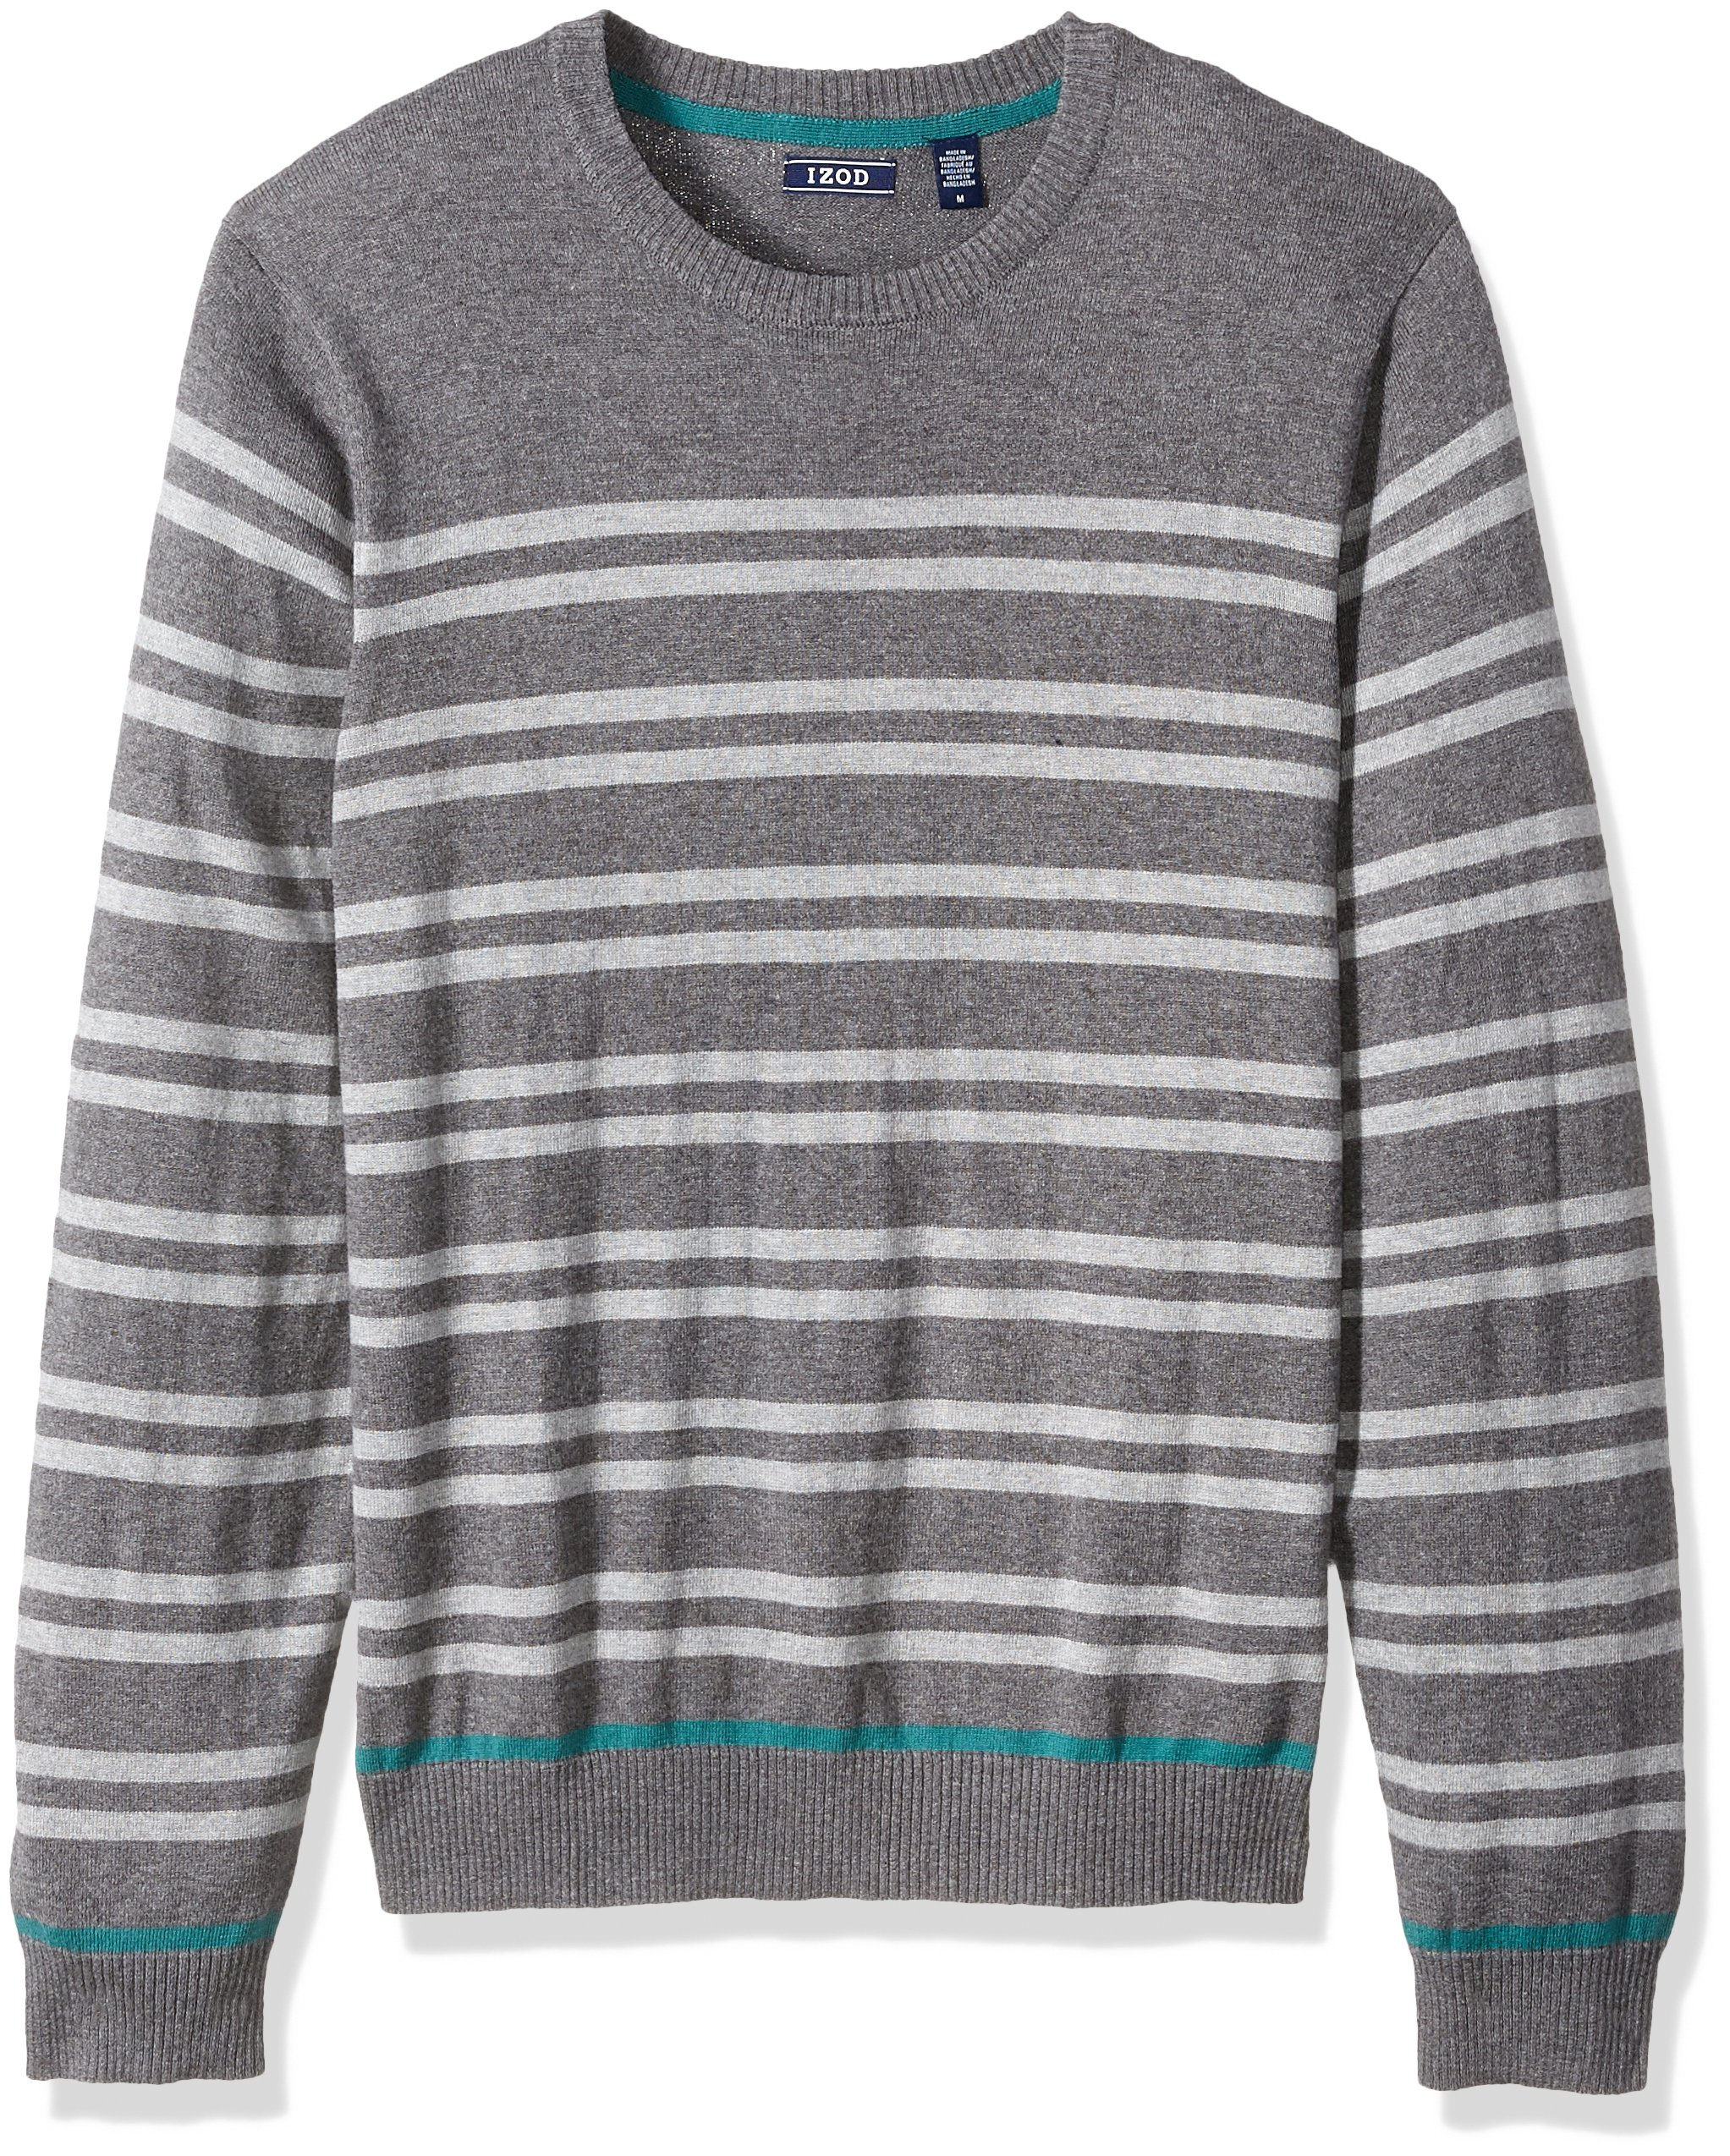 IZOD Men's Fine Gauge Crew Sweater, Carbon Heather, Large